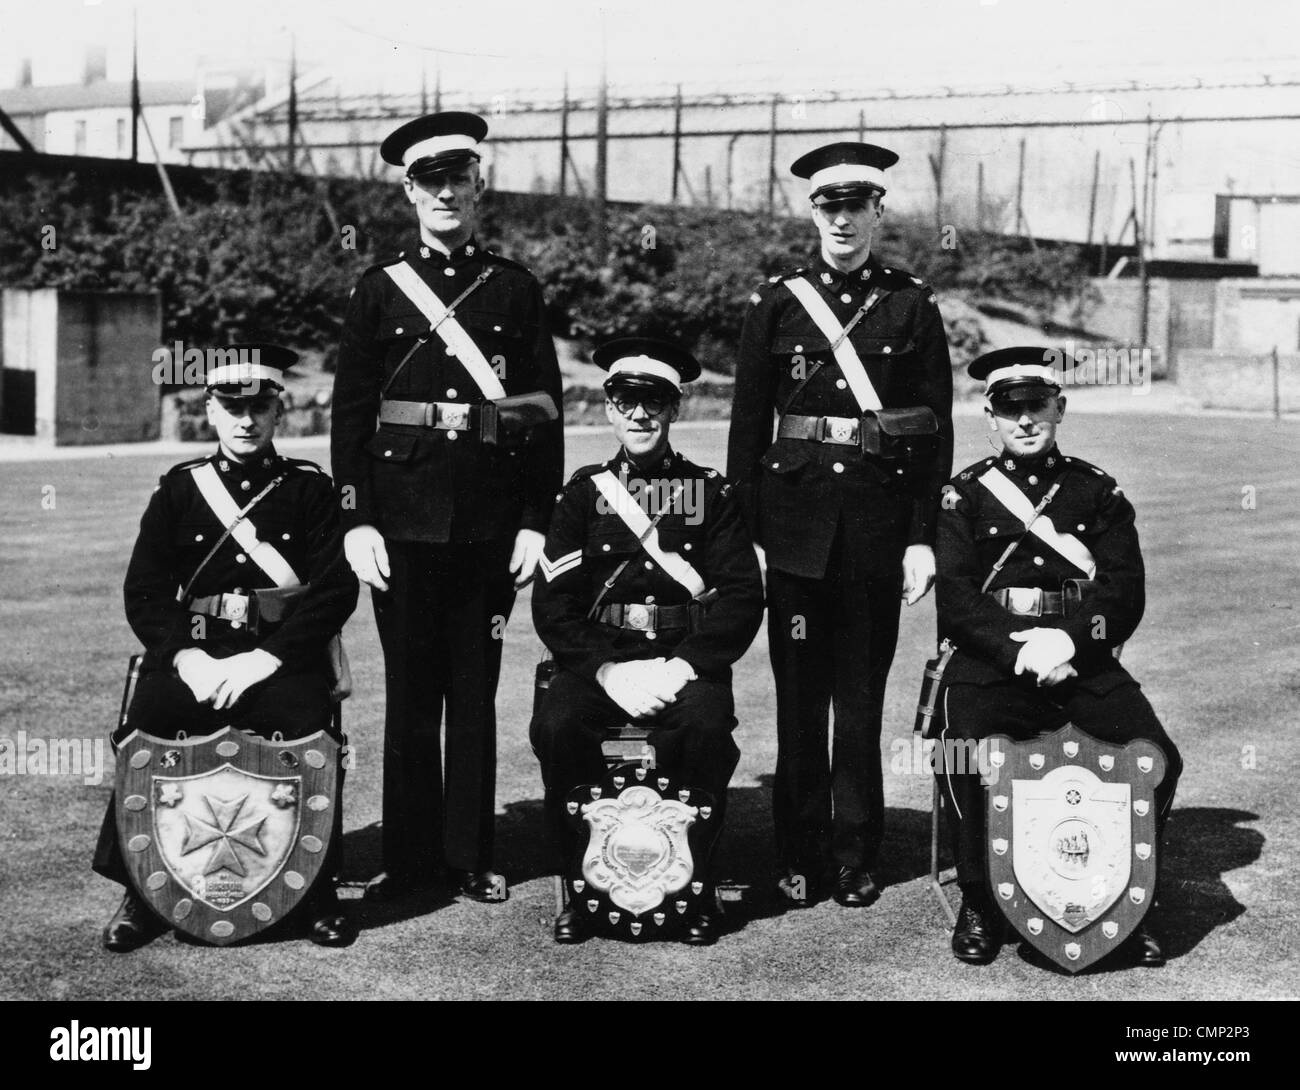 St. John's Ambulance Brigade, GKN Sankey, Wolverhampton, 1946. The Brigade in Bilston - winners of the Burton Shield Stock Photo